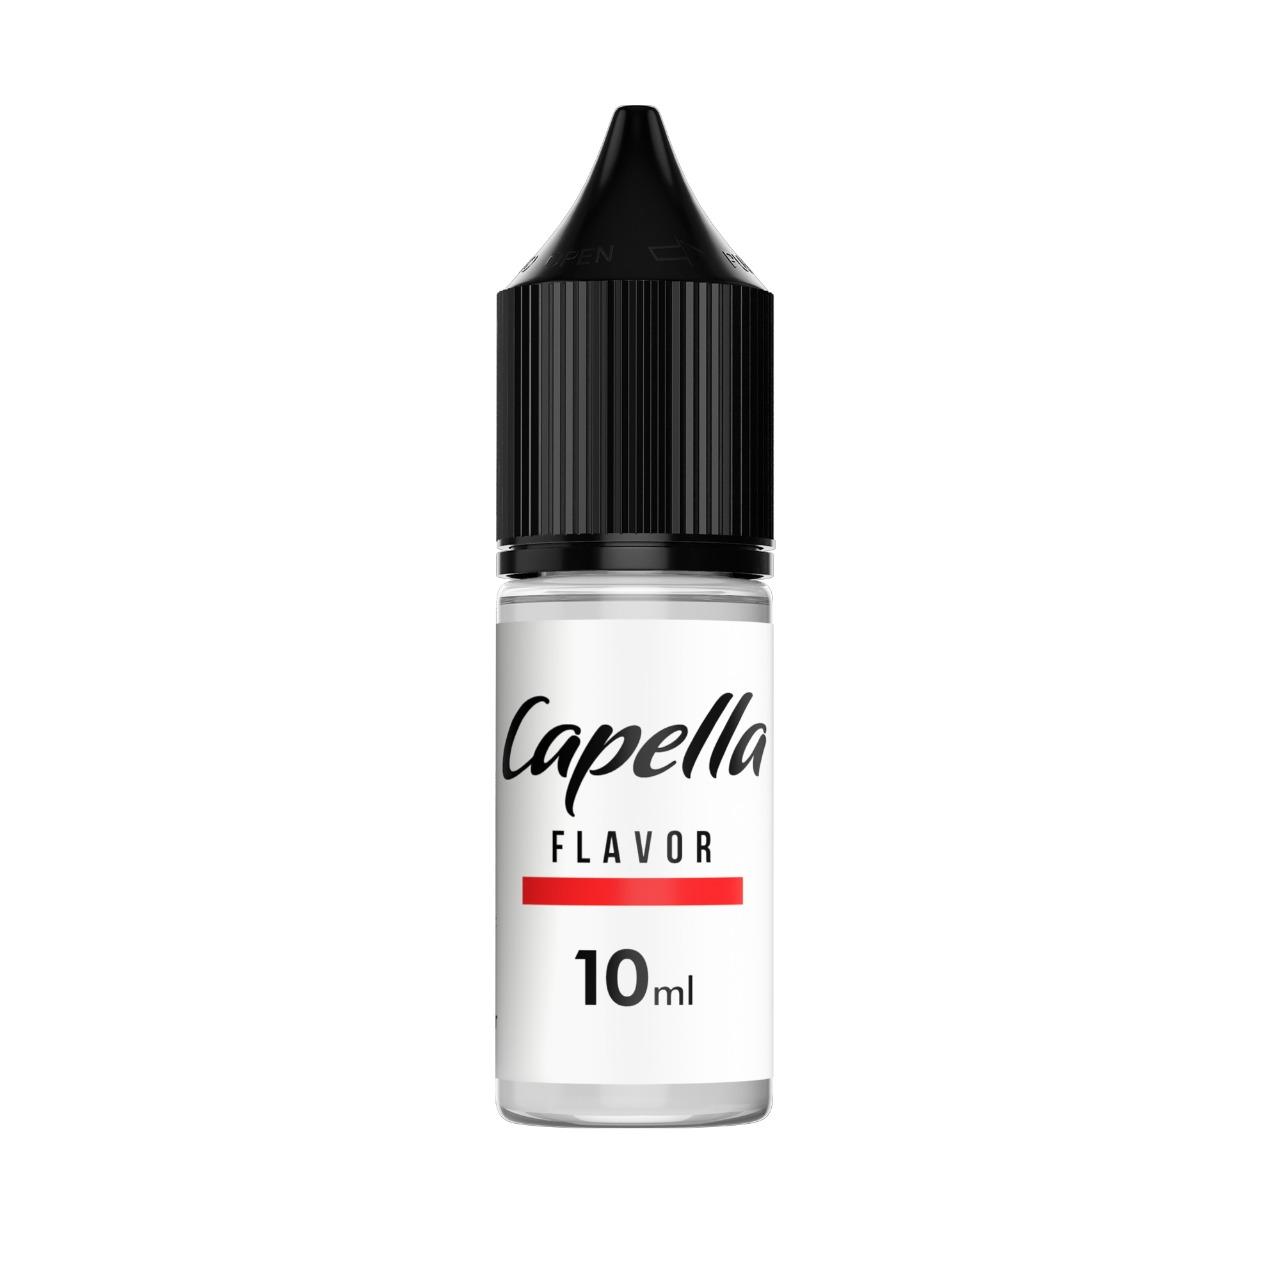 Capella (CAP) New York Cheesecake 10ml